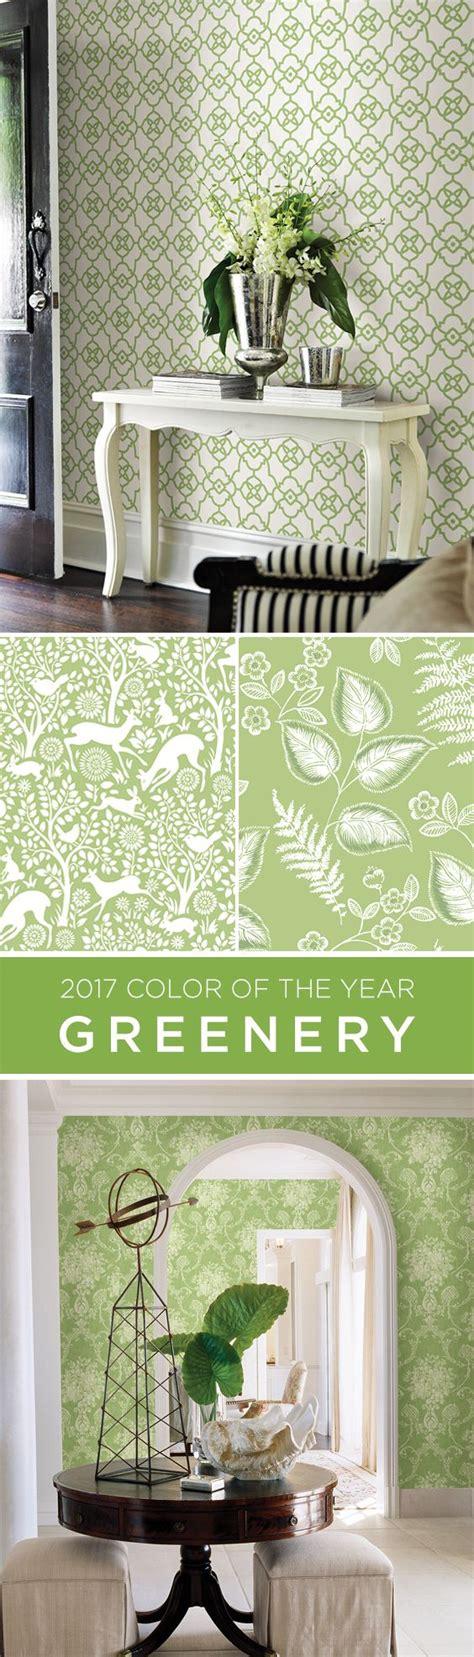 paint color trends for 2017 hatchett design remodel